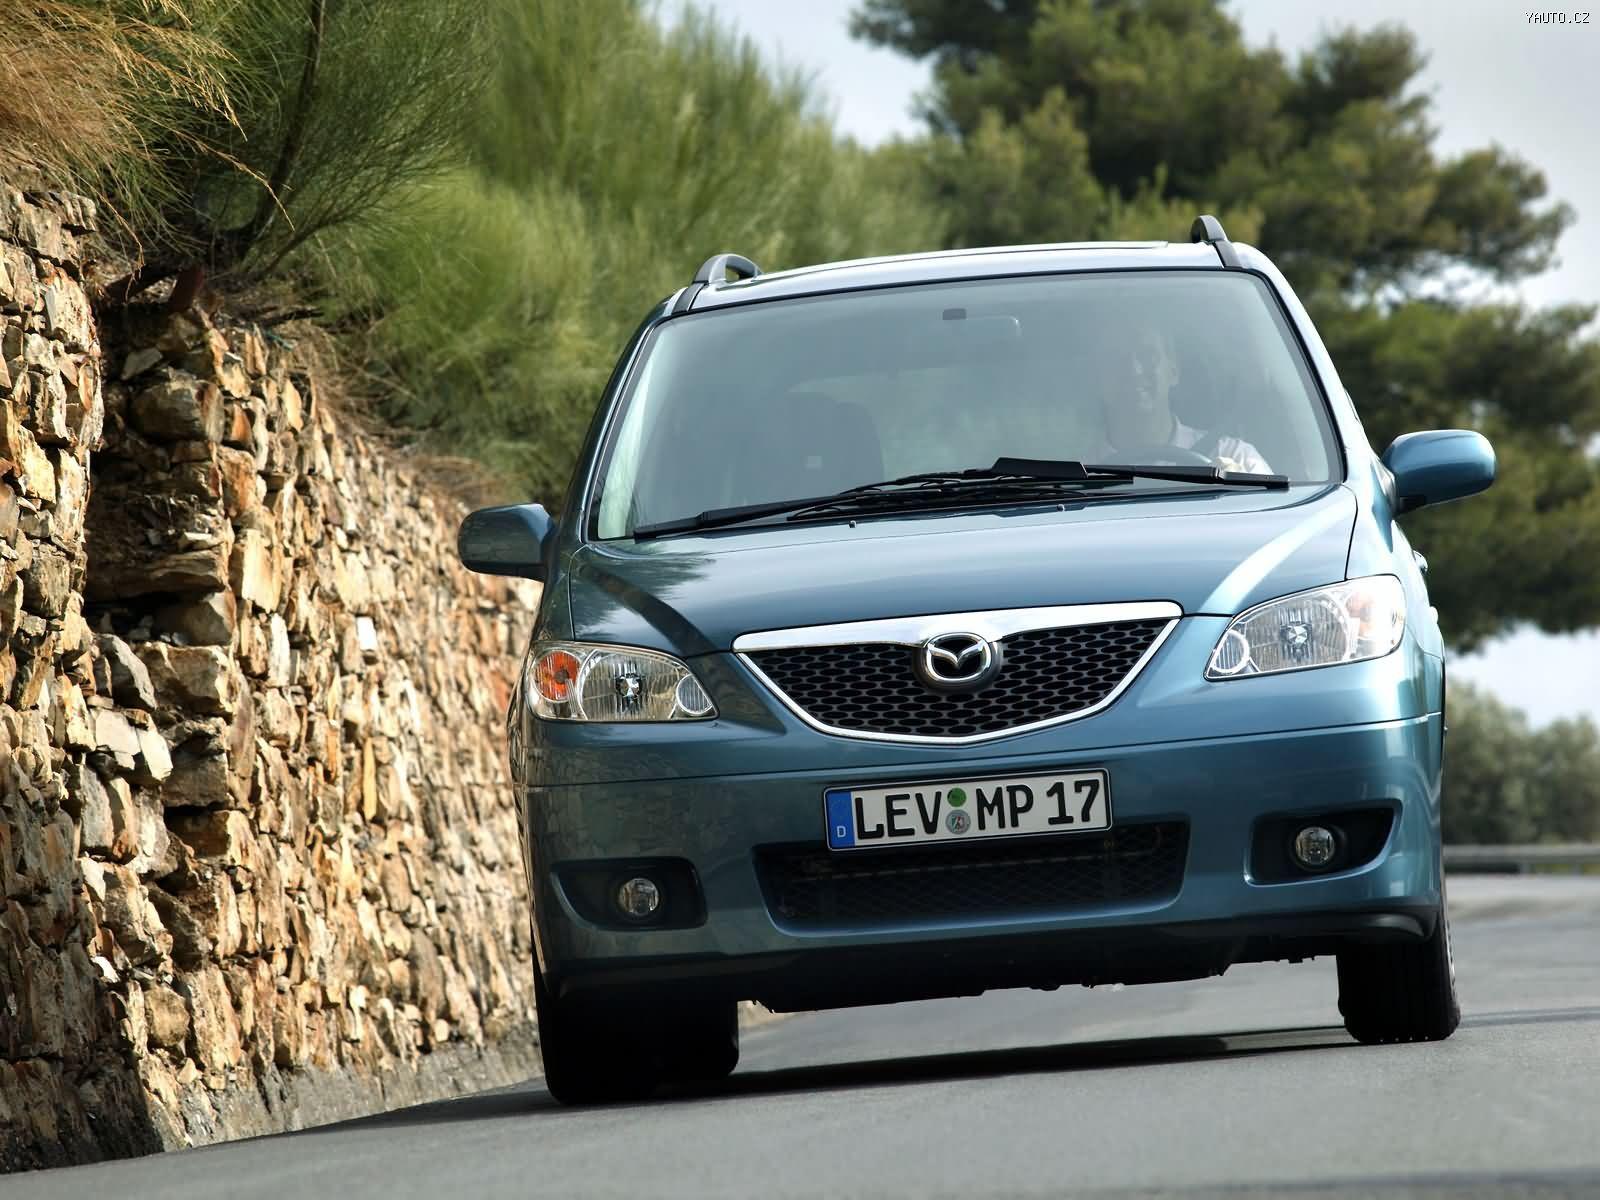 https://img.yauto.cz/tapety/Mazda_MPV_2004_11.jpg